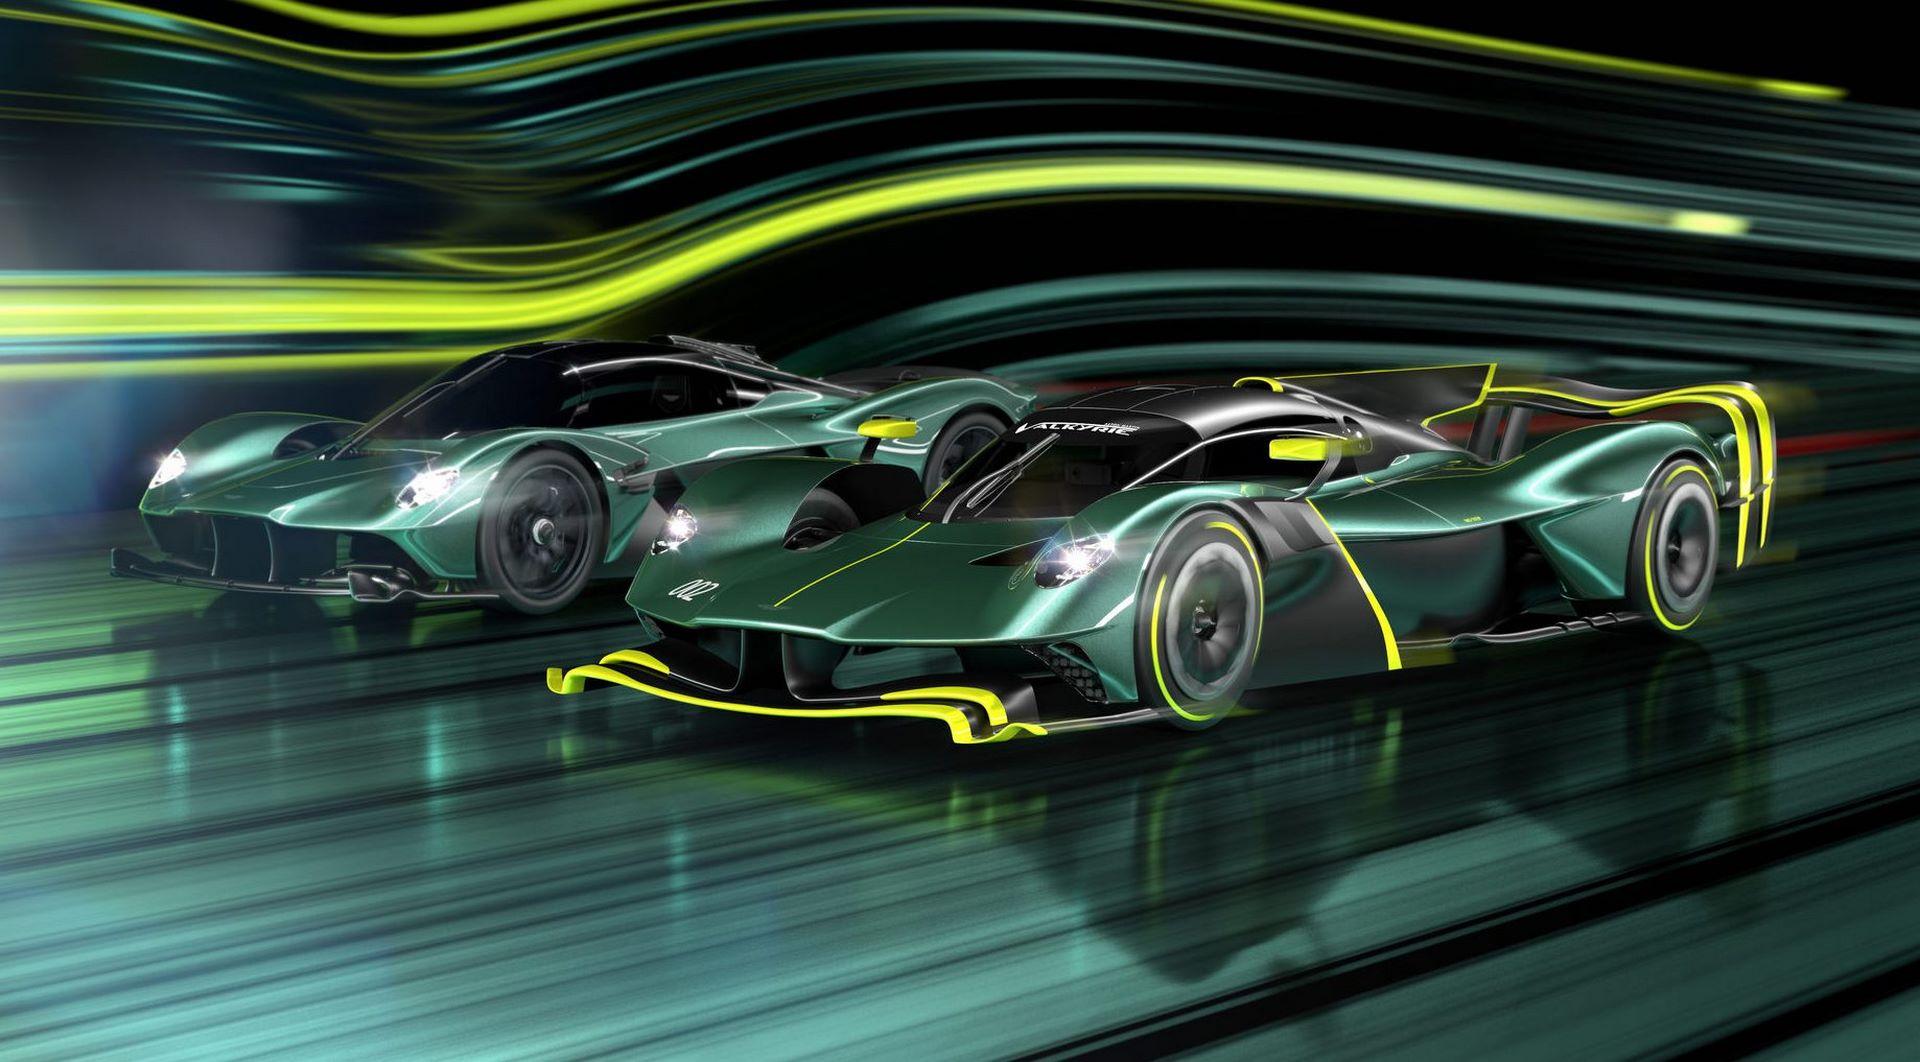 Aston-Martin-Valkyrie-AMR-Pro-production-version-6